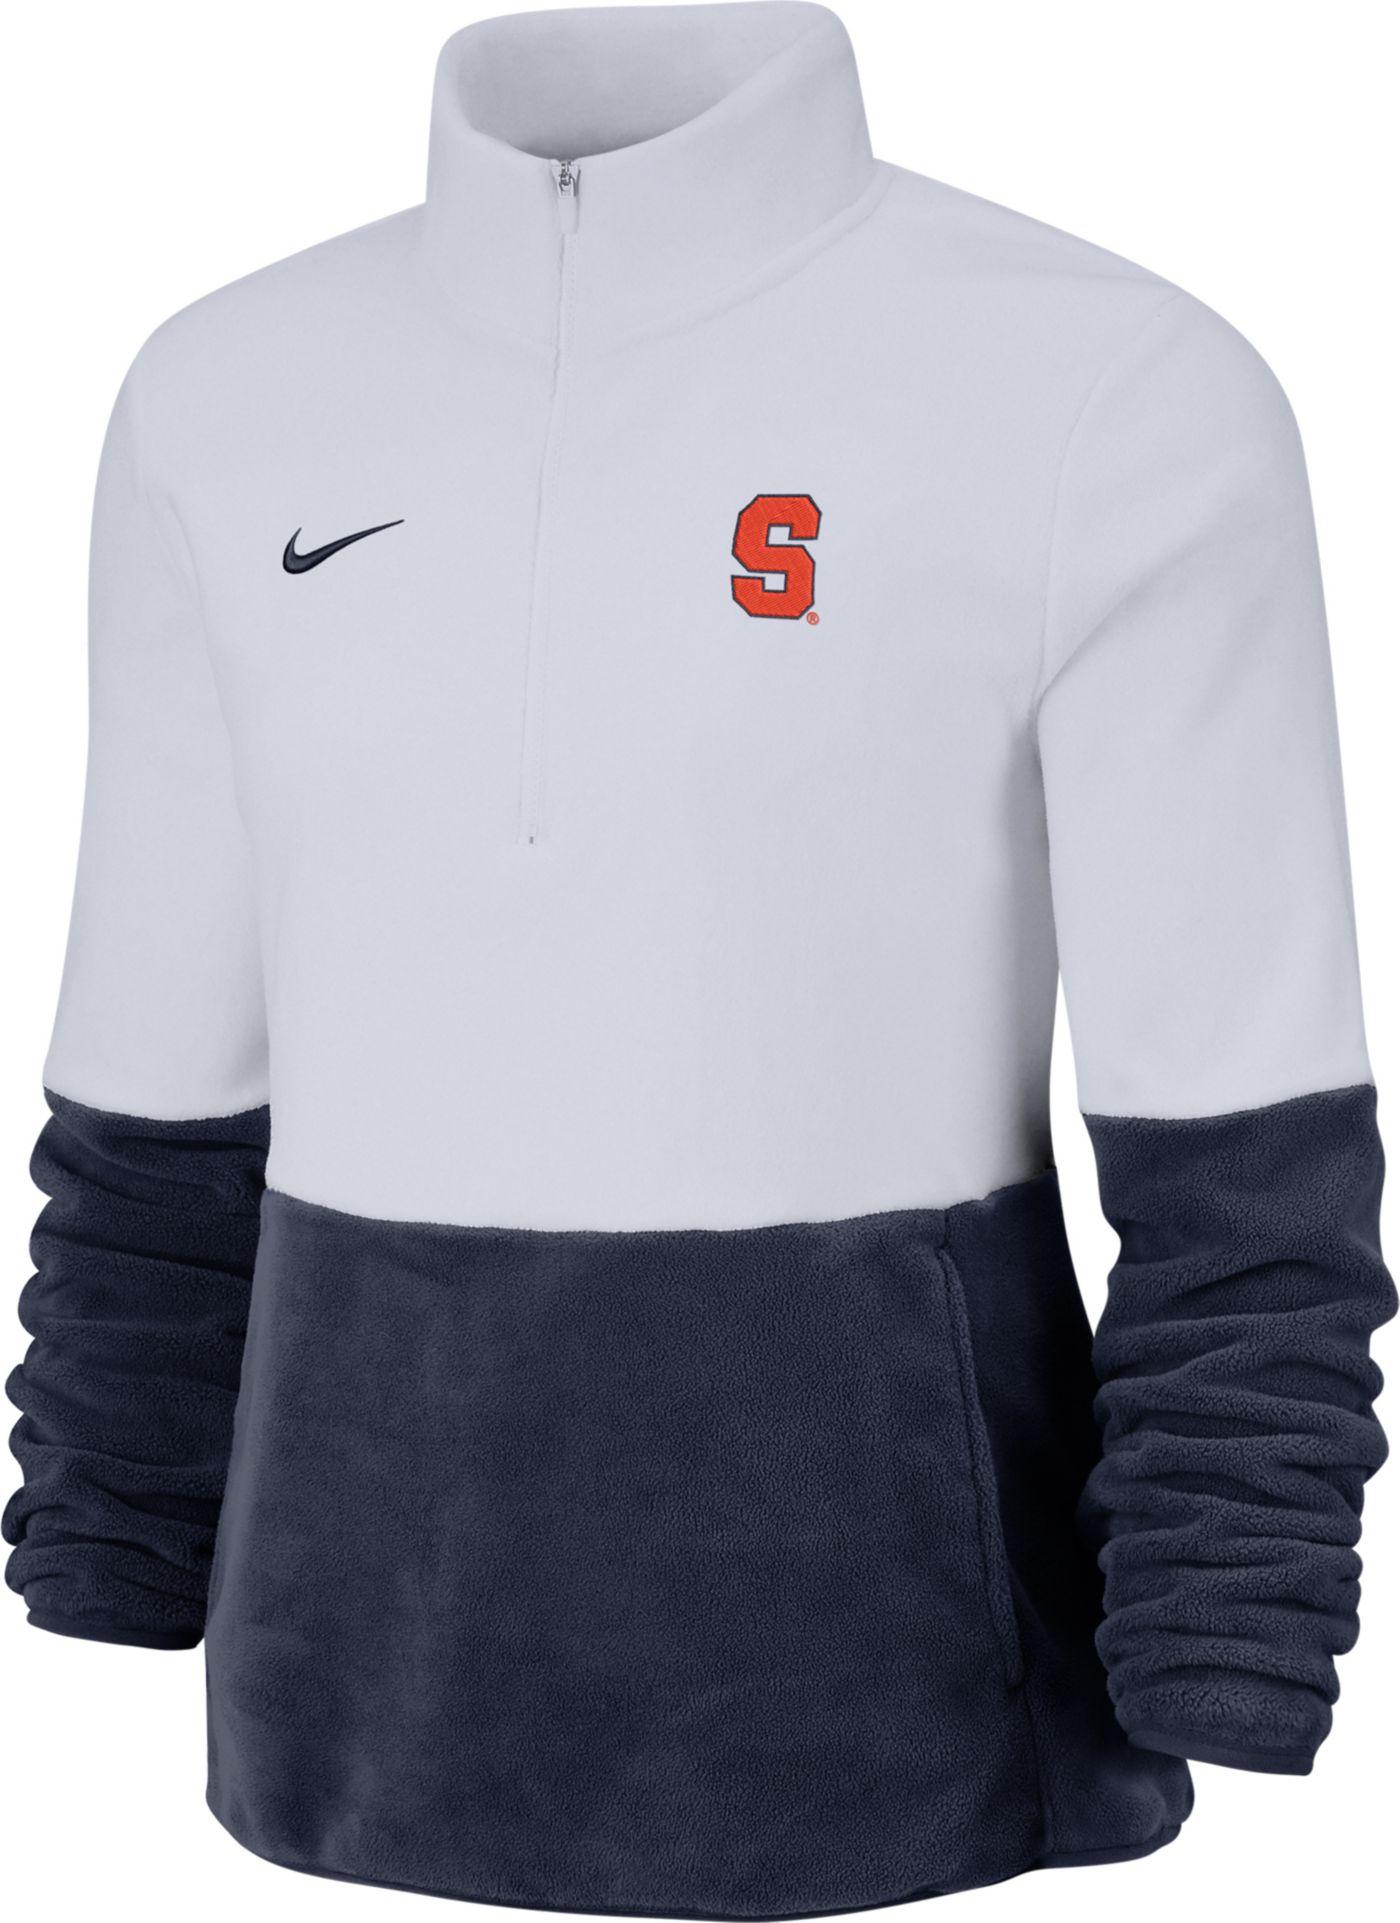 Nike Women's Syracuse Orange Cozy Therma White Half-Zip Fleece